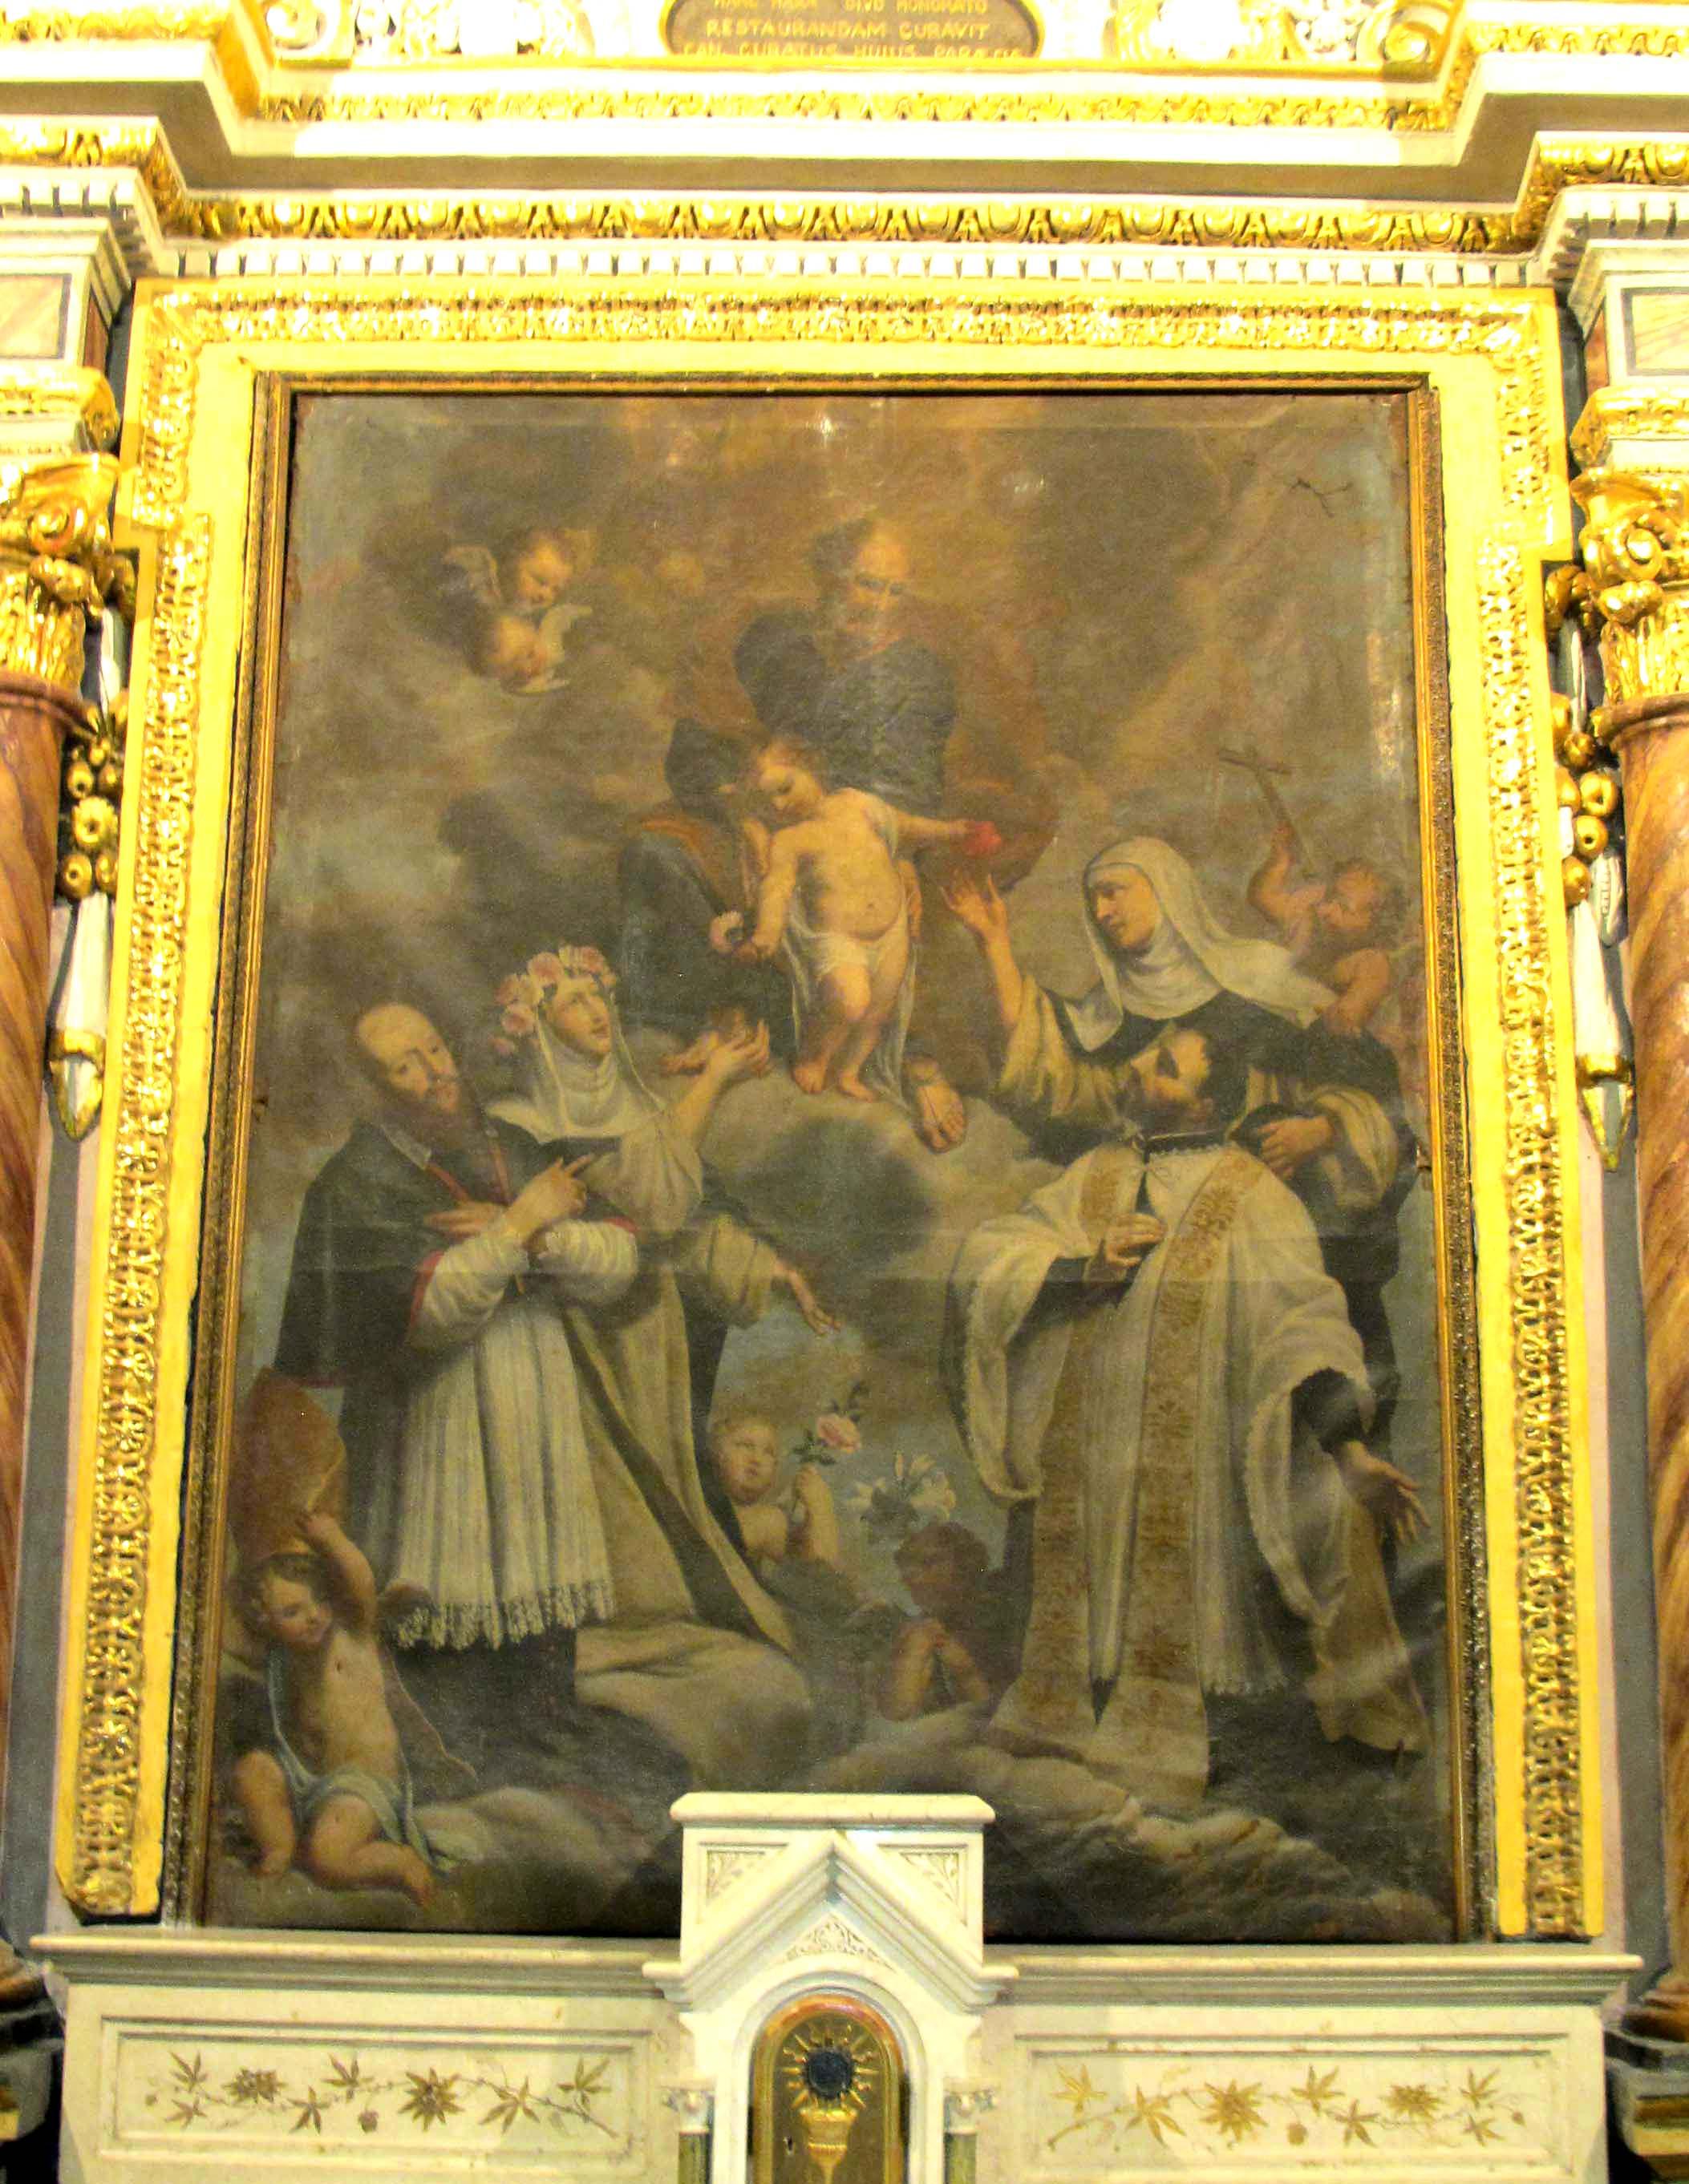 ANONIMO, San Giuseppe e i Santi Francesco di Sales, Francesco Saverio, Rosa da Lima e Caterina da Siena (sec. XVIII)